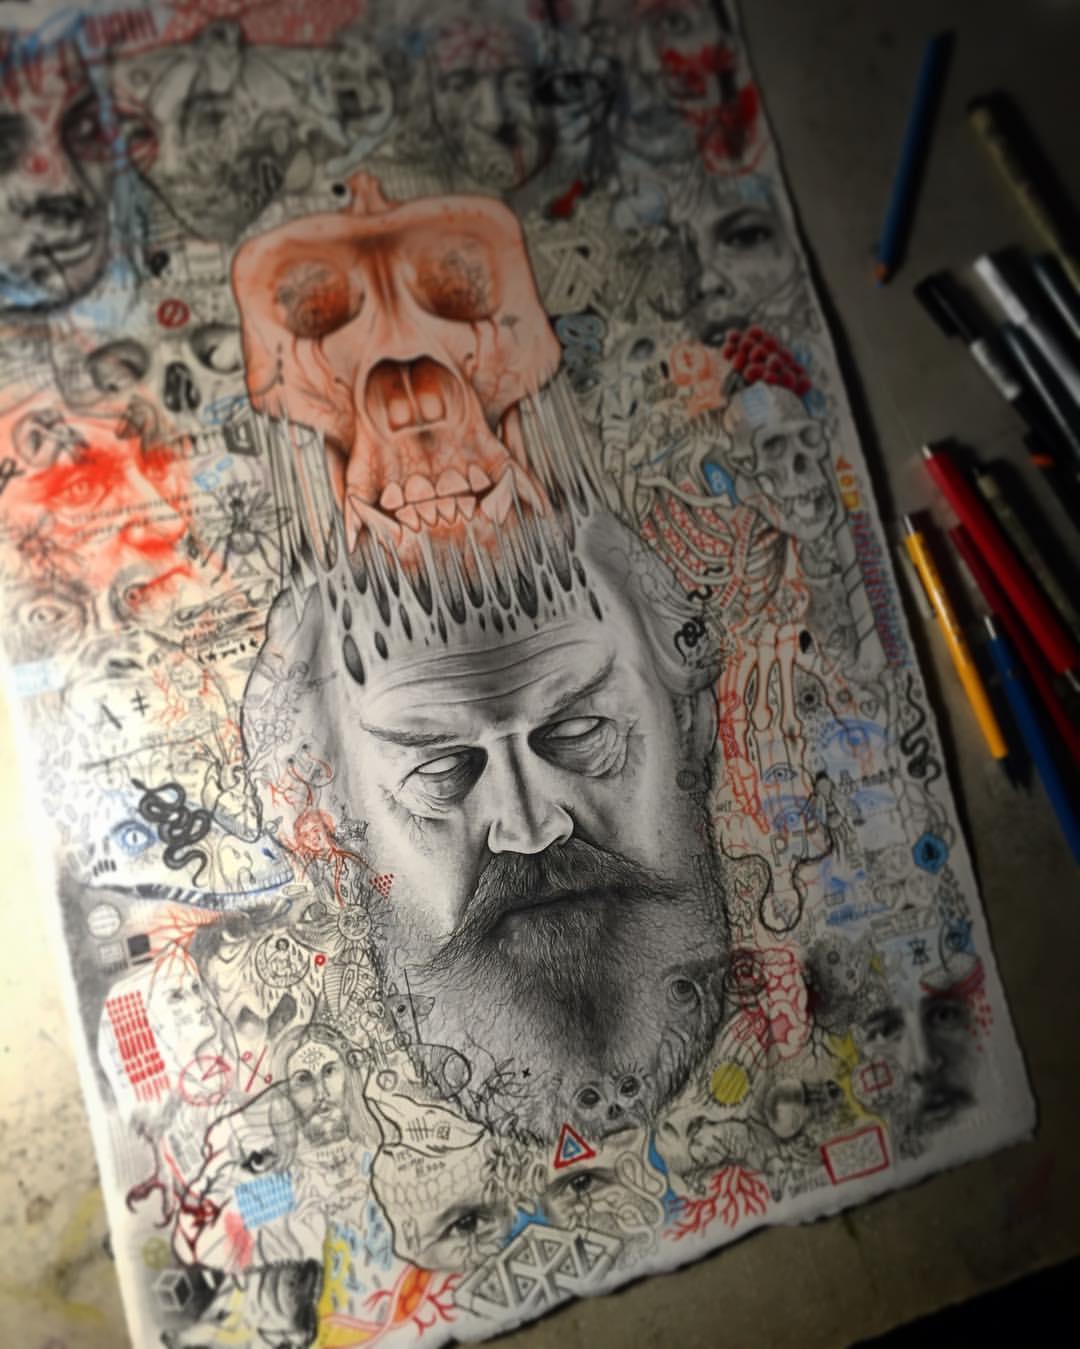 paul-jackson-ilustracao-desenho-dionisio-arte-09